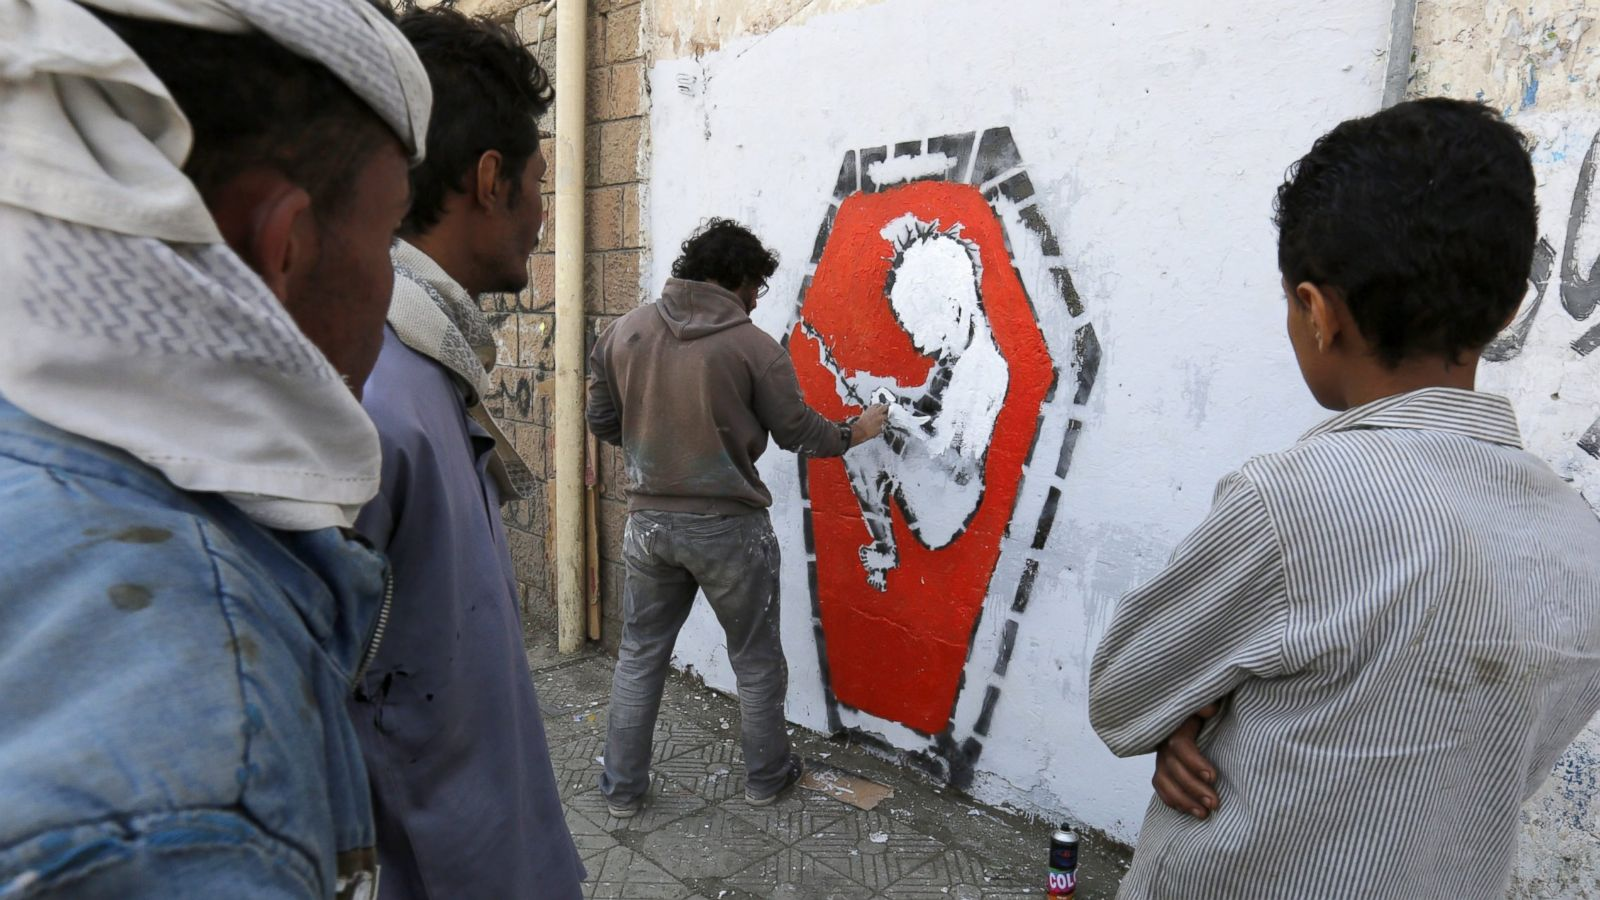 Graffiti artist portrays the horrors of war in yemen abc news